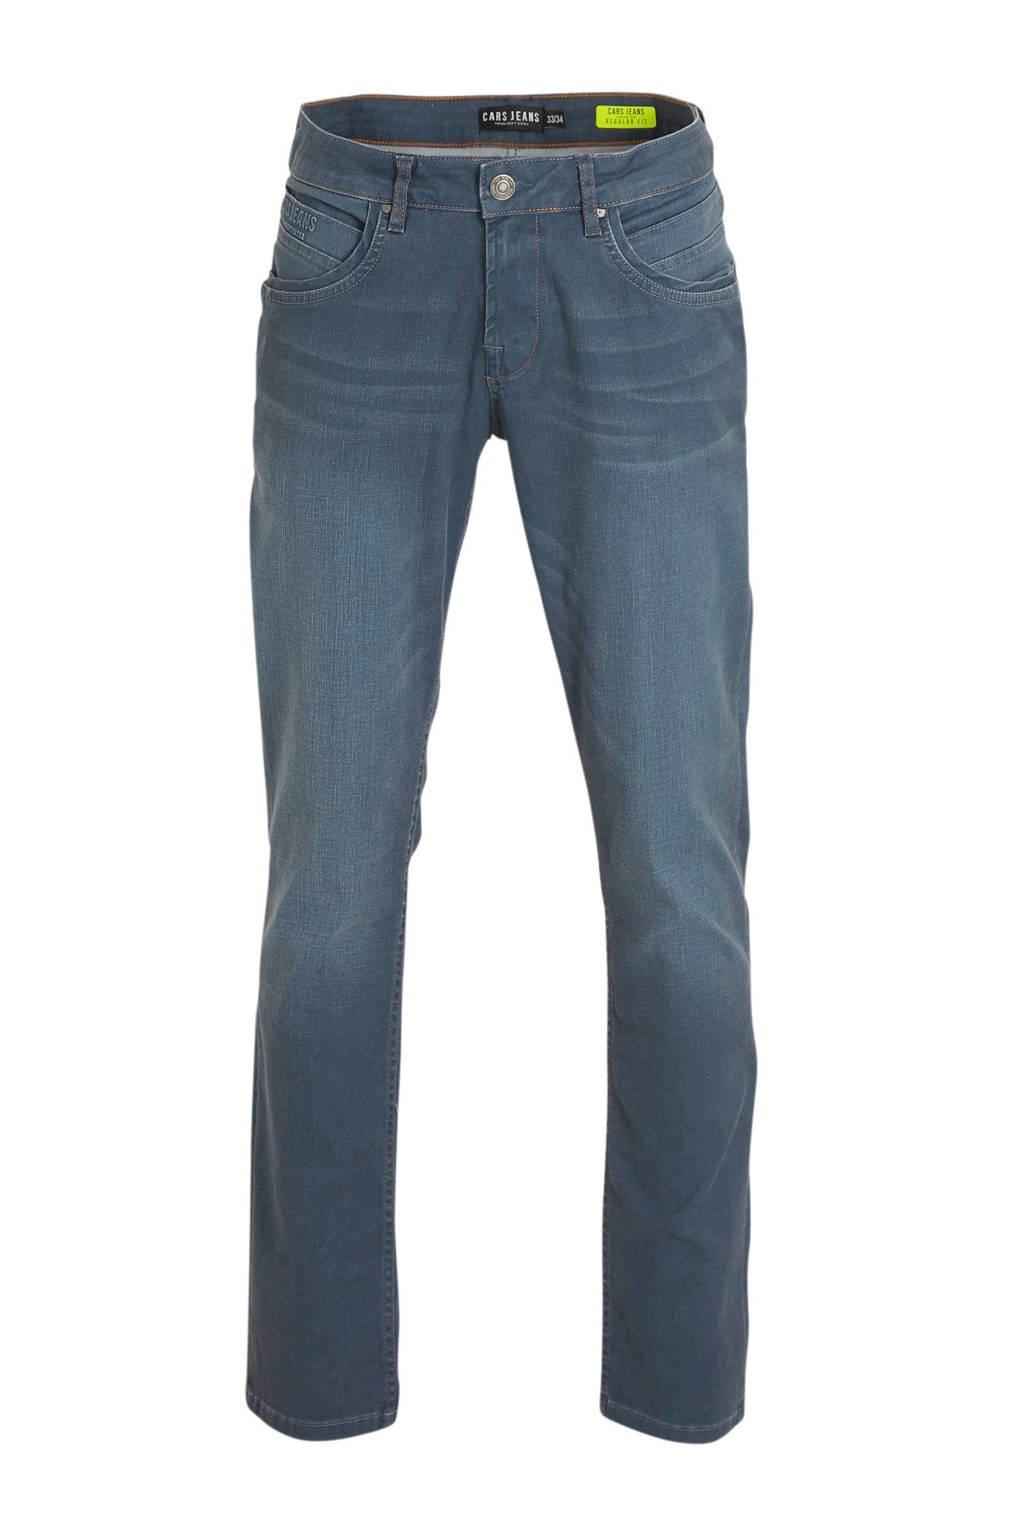 Cars regular fit jeans Henlow, Grey Blue